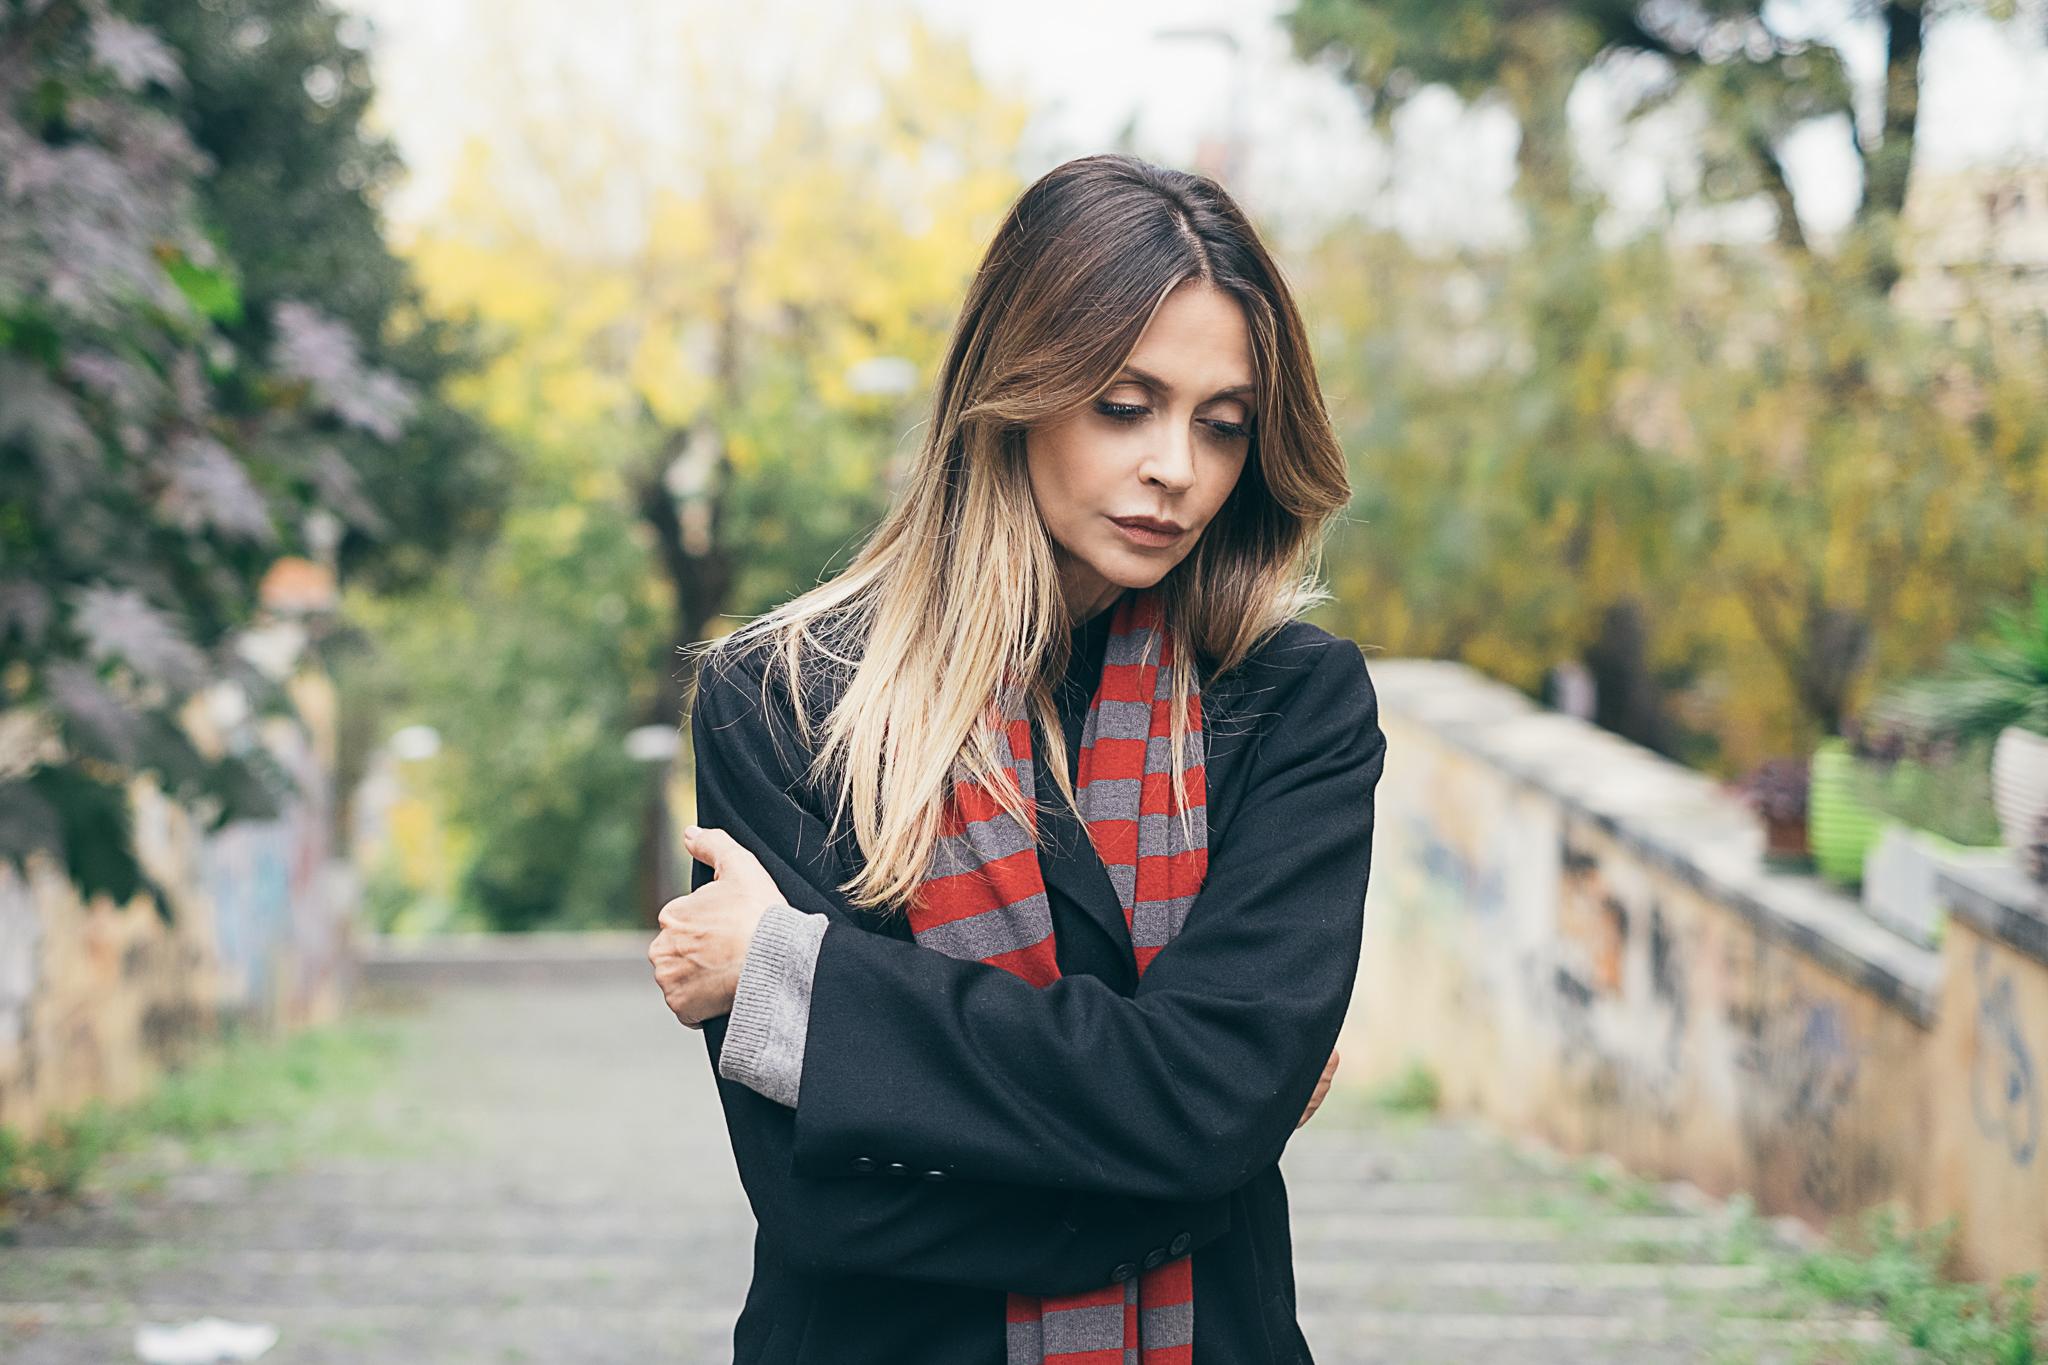 Ritratti_Elda Alvigini2017 (3)